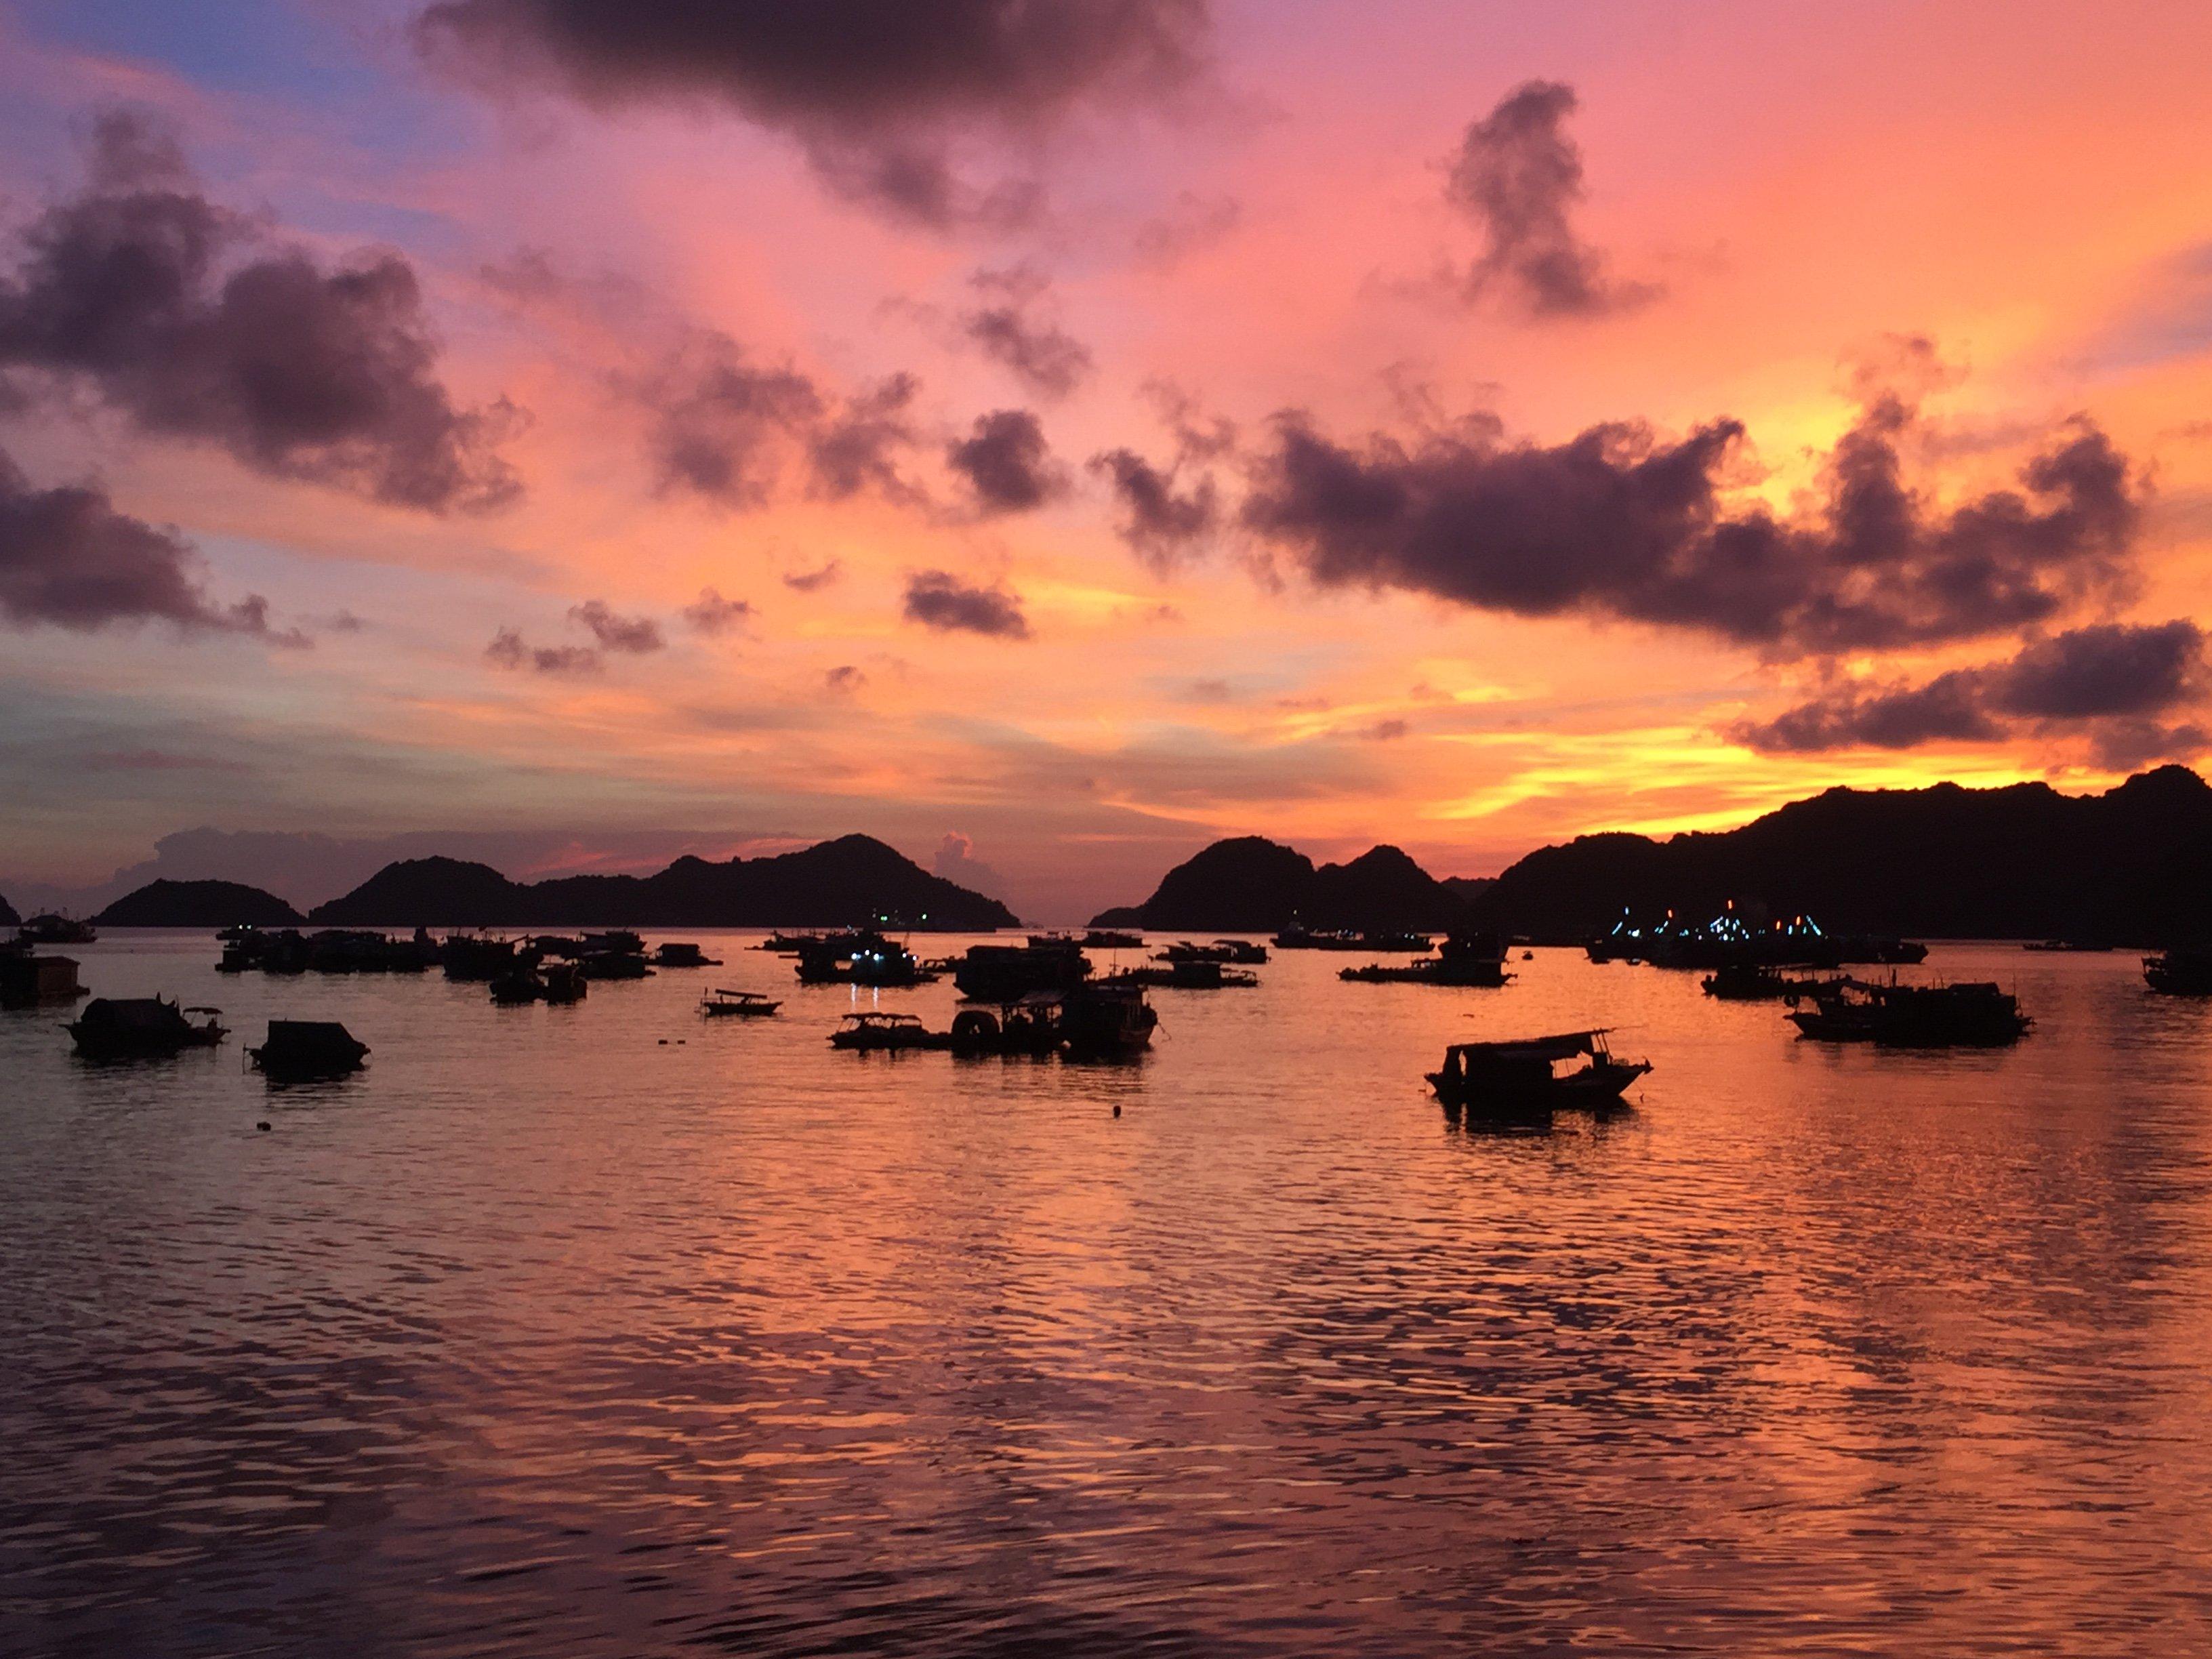 Top Instagram Accounts You Should Follow For Vietnam Travel Inspiration